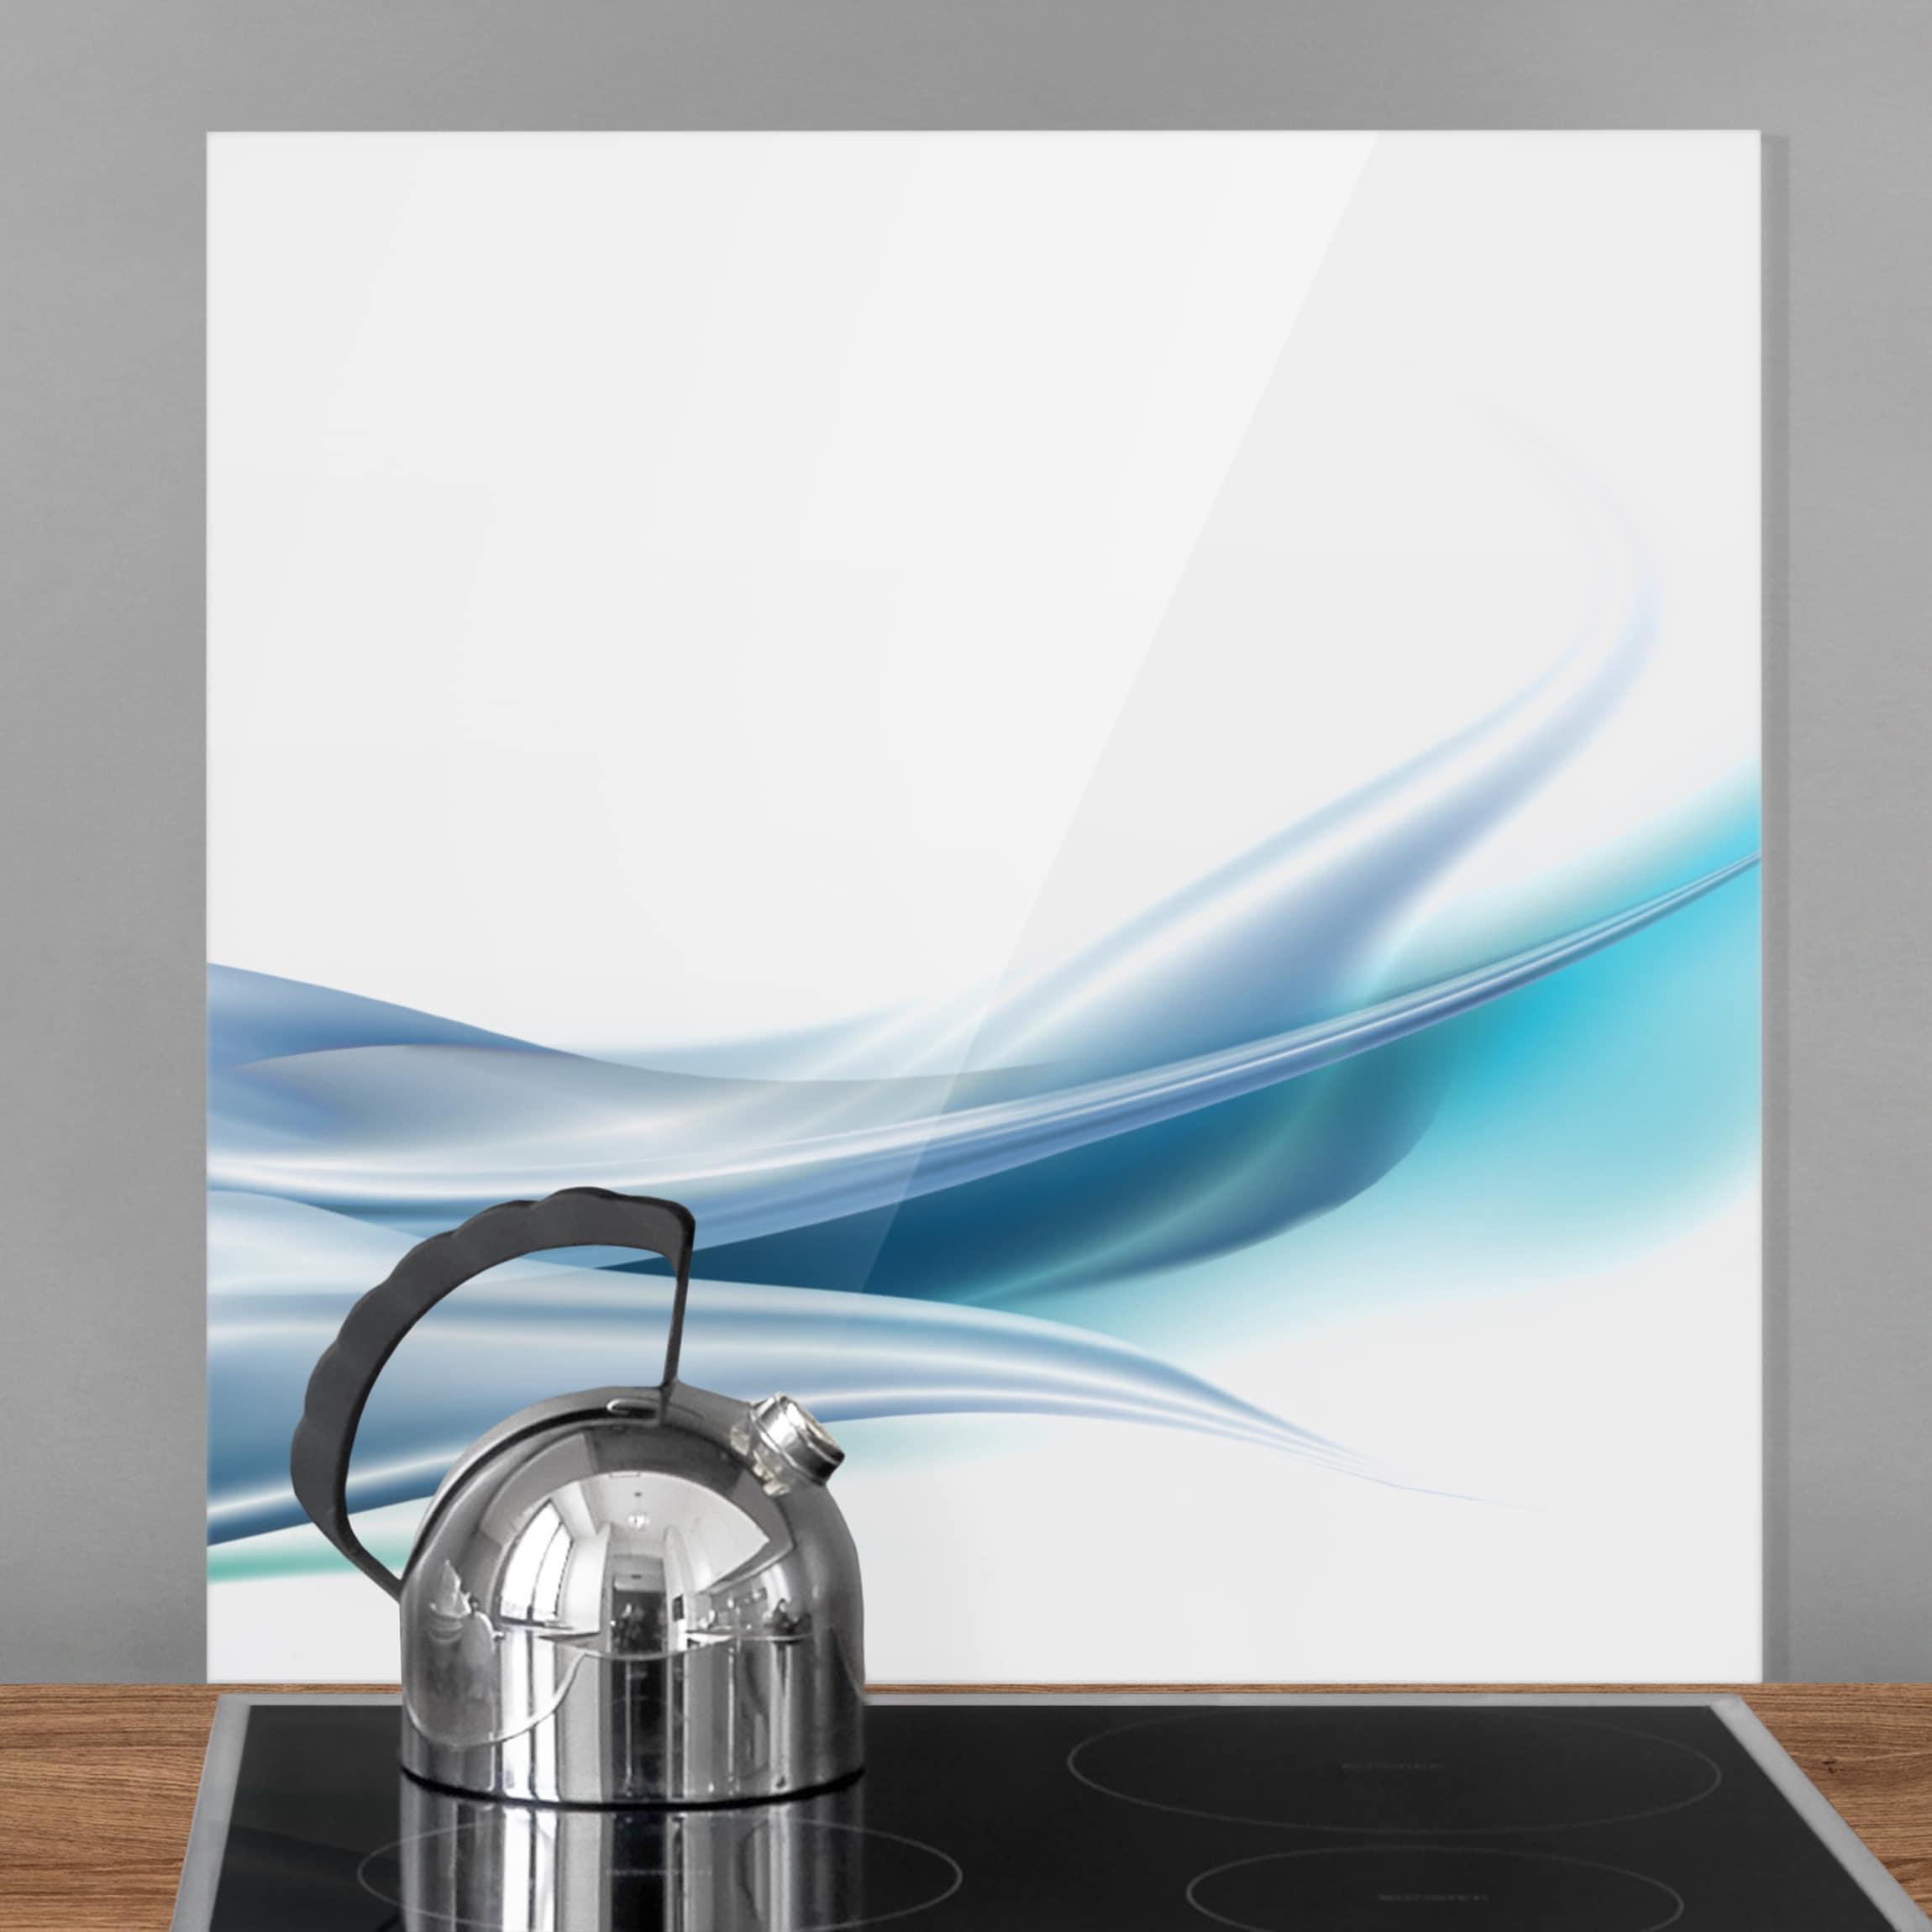 Spritzschutz glas blue dust quadrat 1 1 for Spritzschutz glas